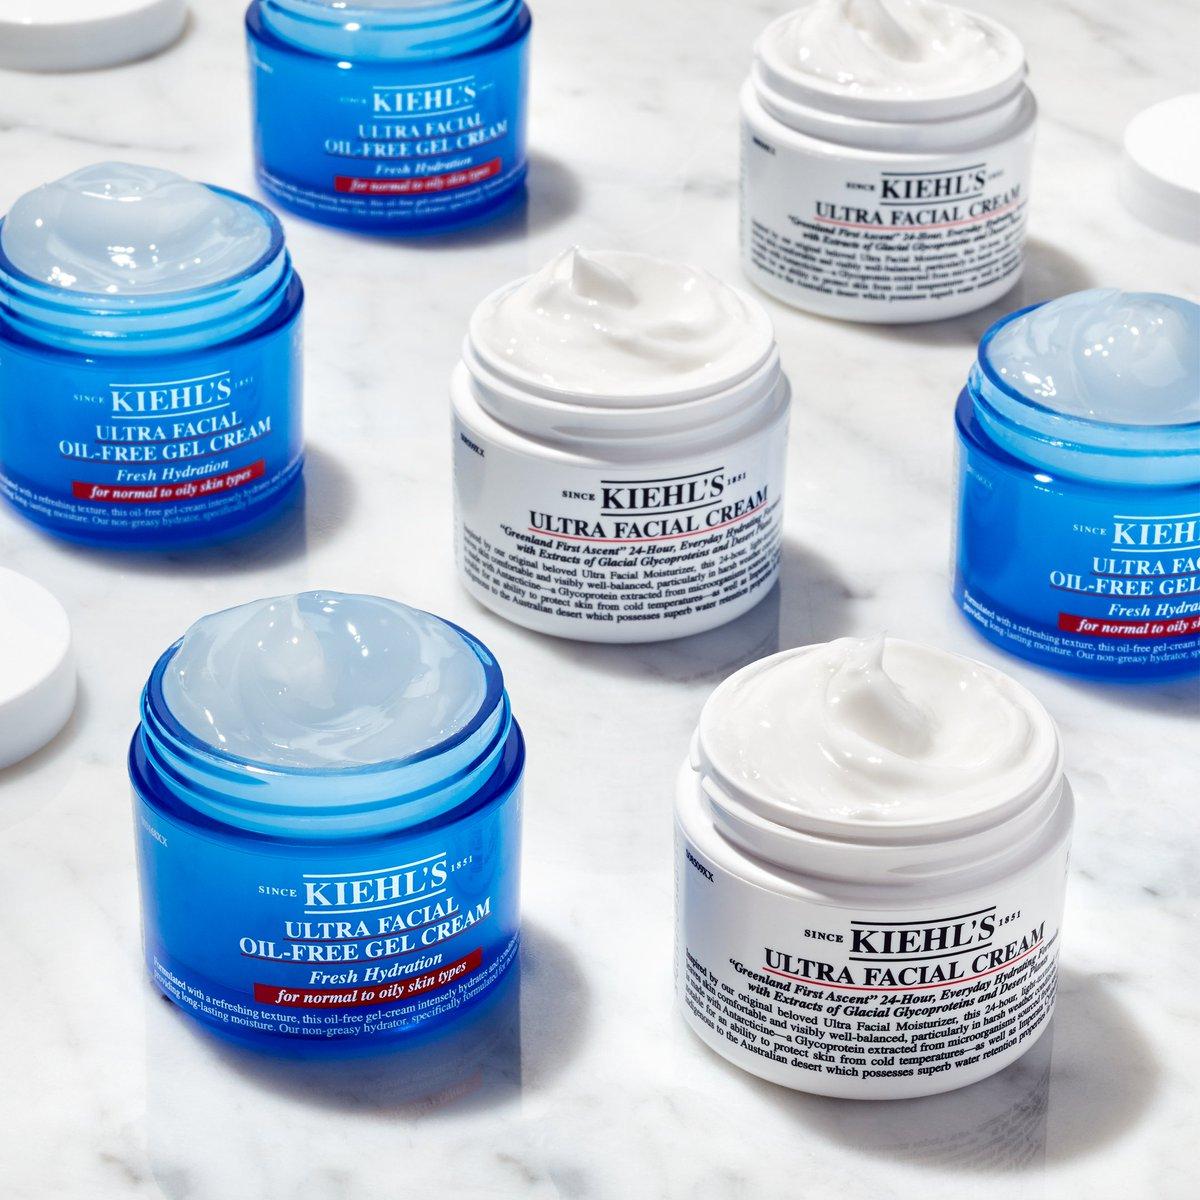 Kiehl's Ultra Facial Oil – Free Gel Cream